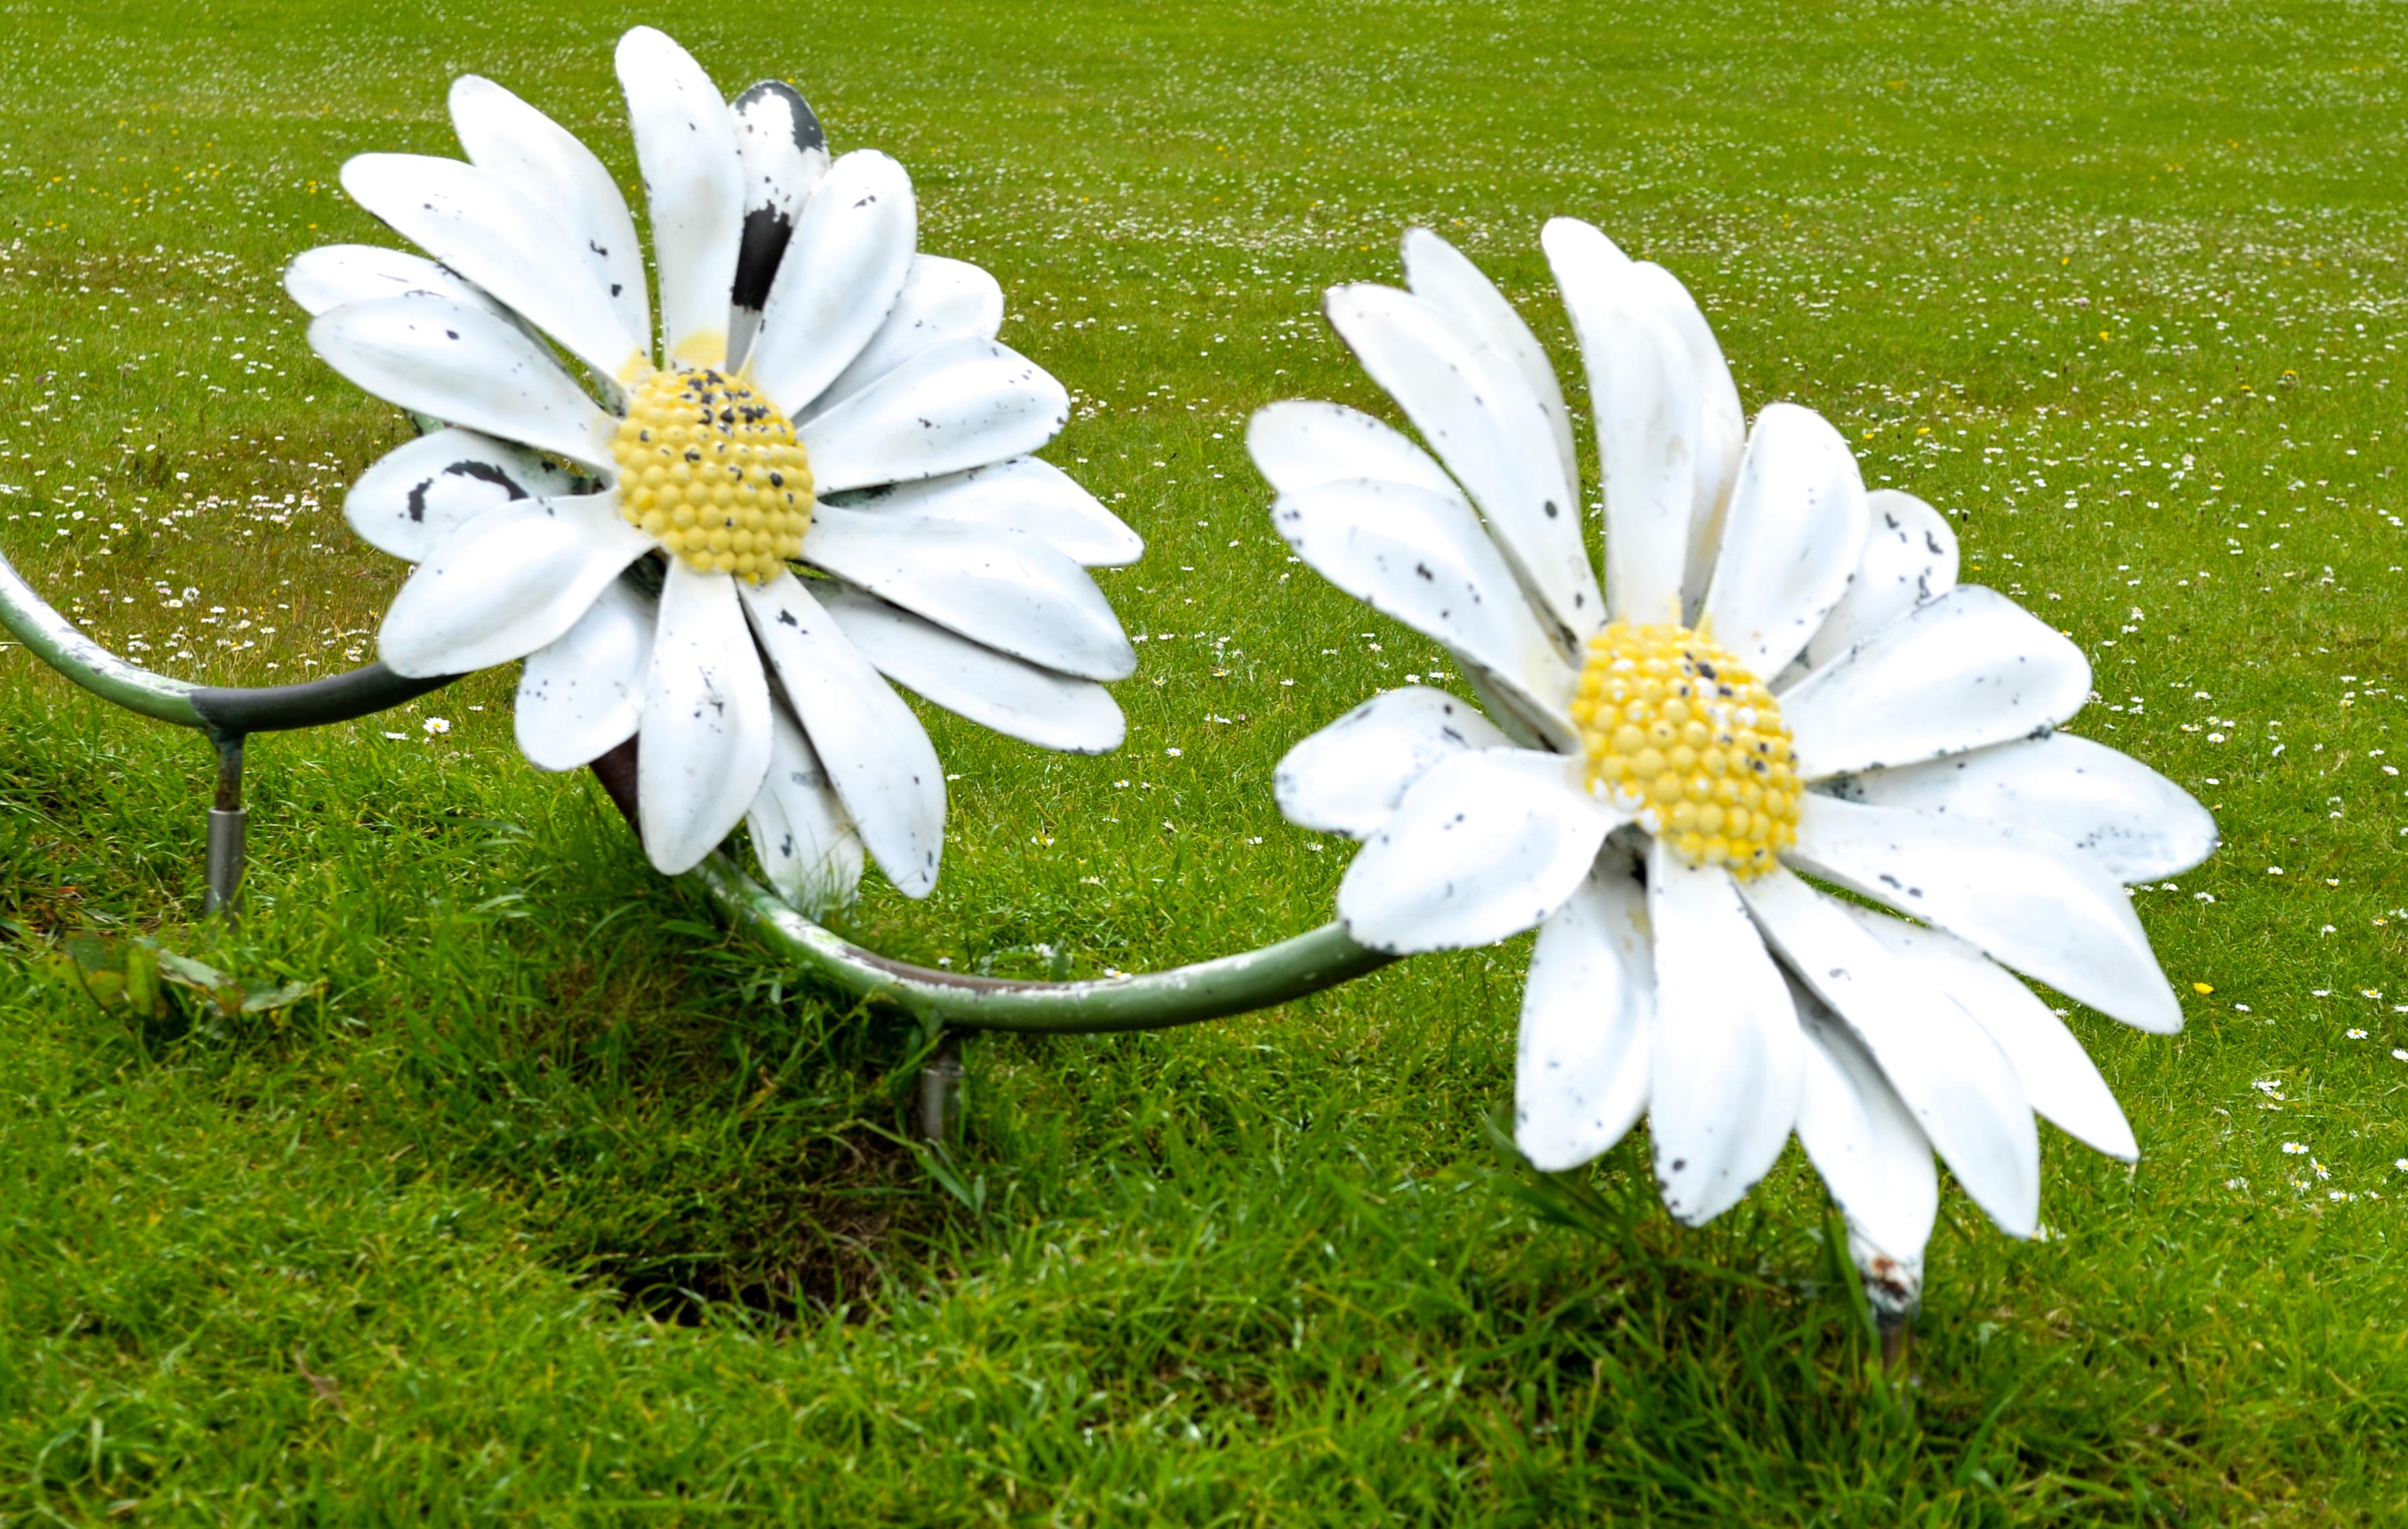 Double daisy sculpture discover bundoran tourist information double daisy sculpture damien mcginley 2015 06 01t2356560000 izmirmasajfo Image collections